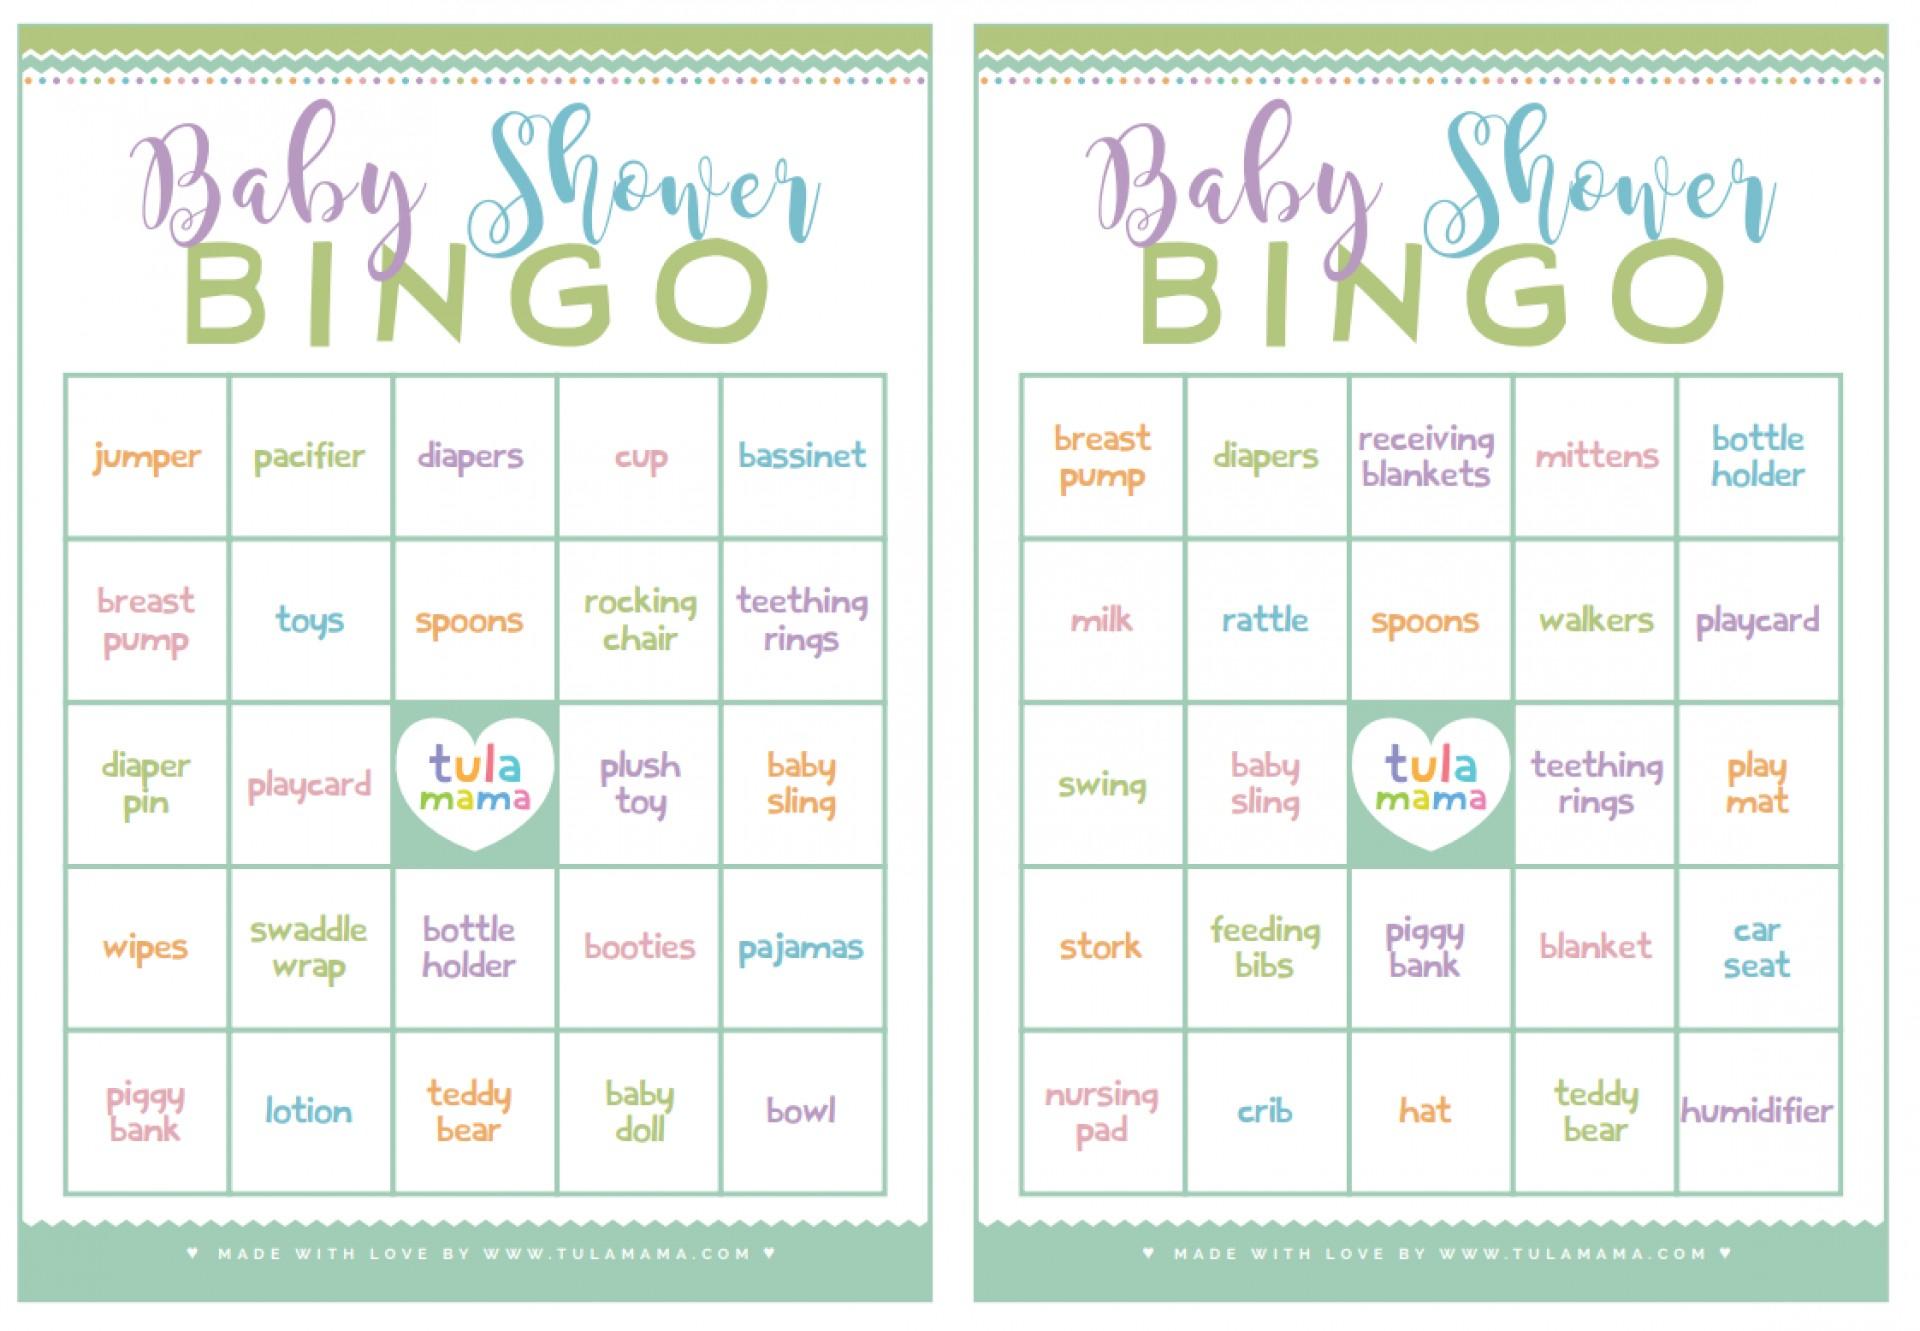 009 Free Dowload Baby Shower Bingo Template Wondrous Ideas Cards - Free Printable Baby Shower Bingo